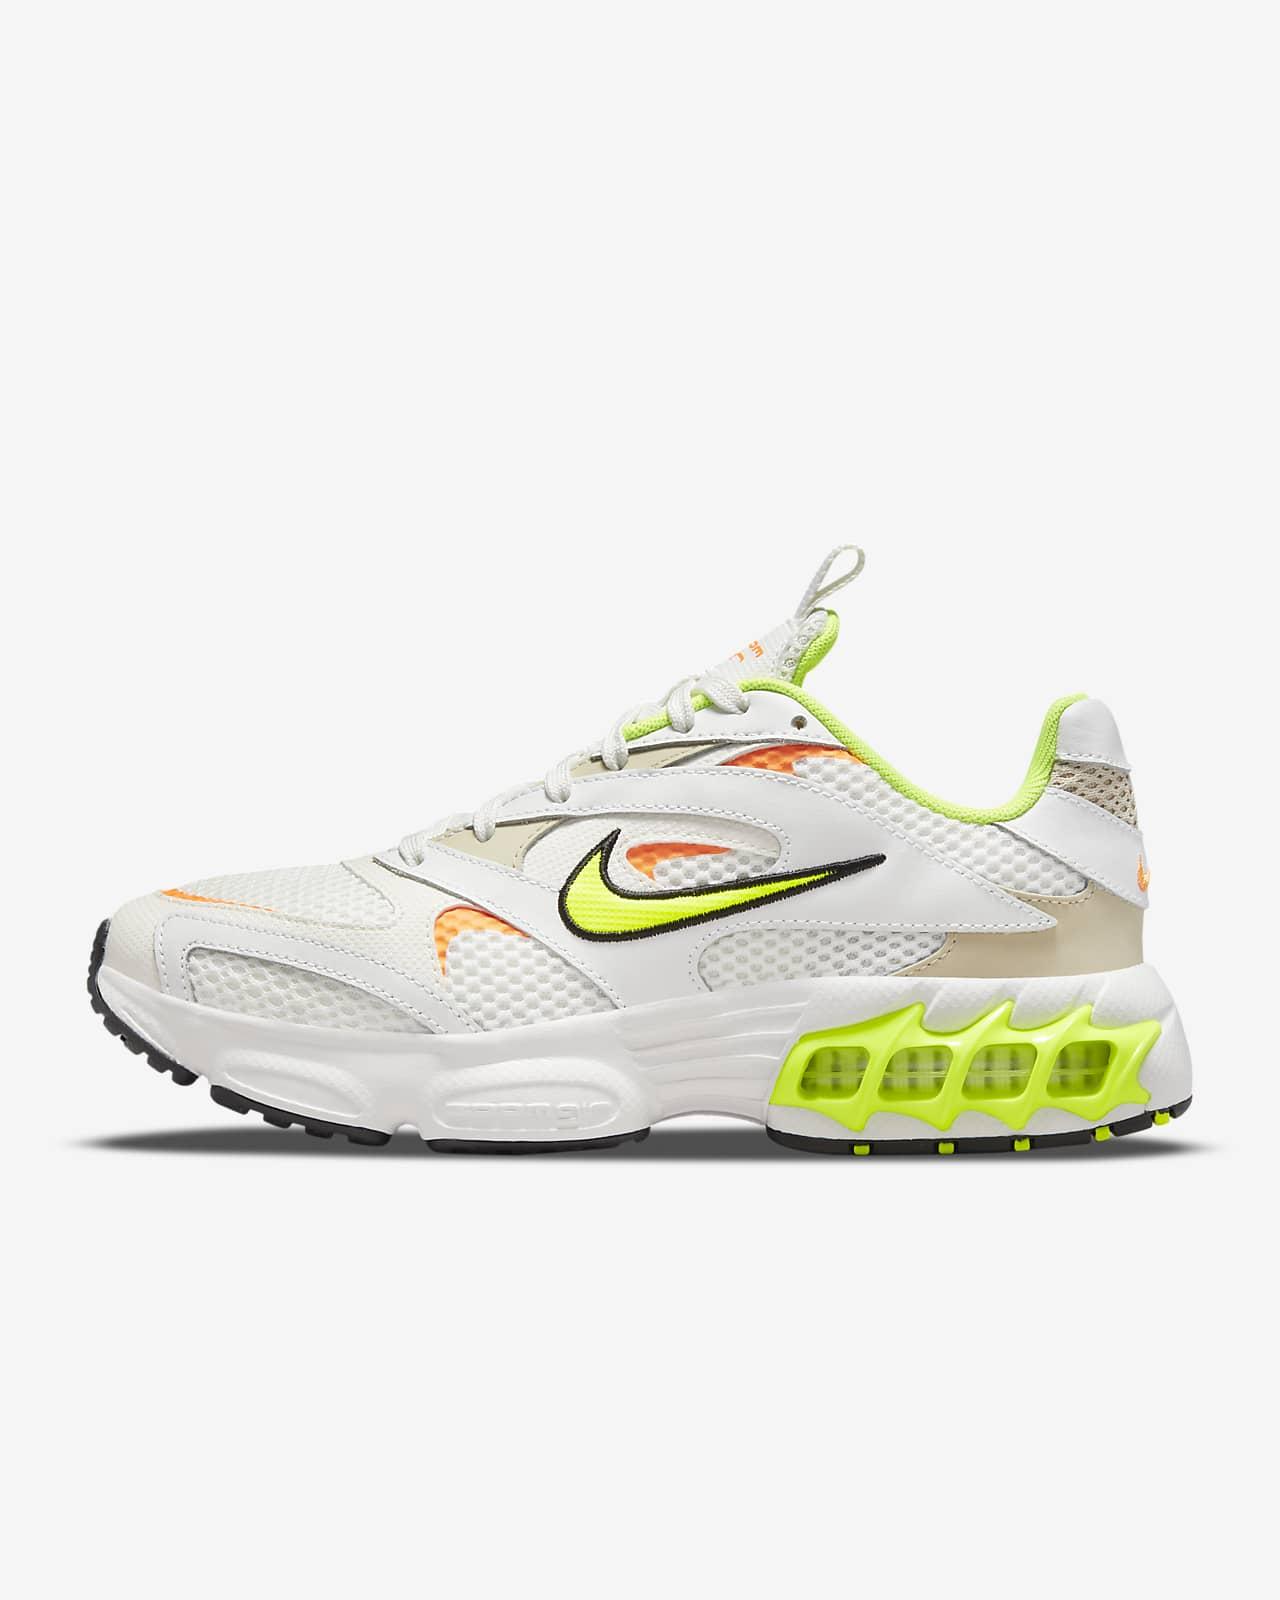 Nike Zoom Air Fire Women's Shoes